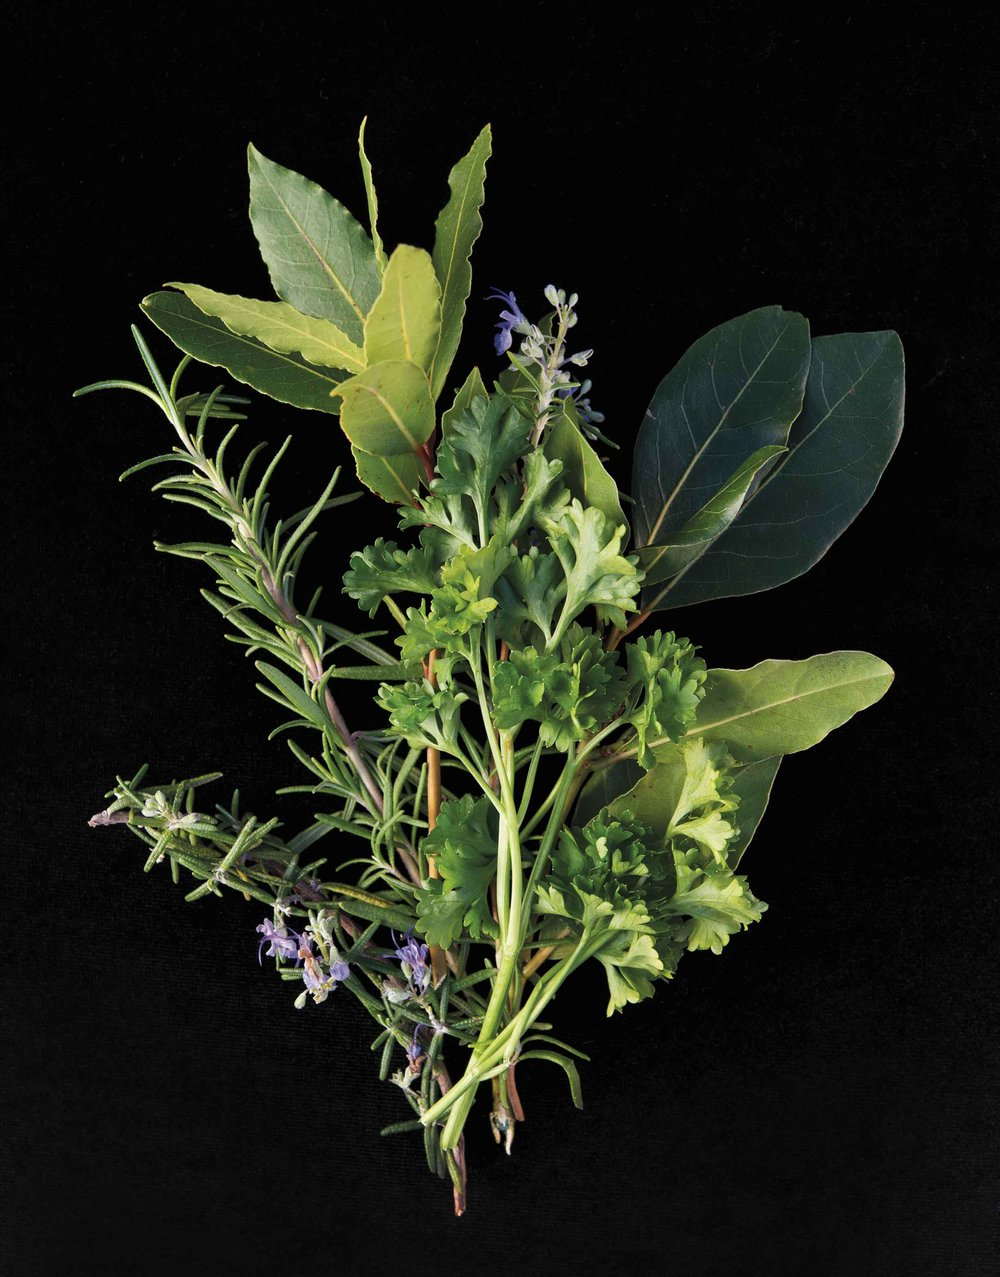 Herb2